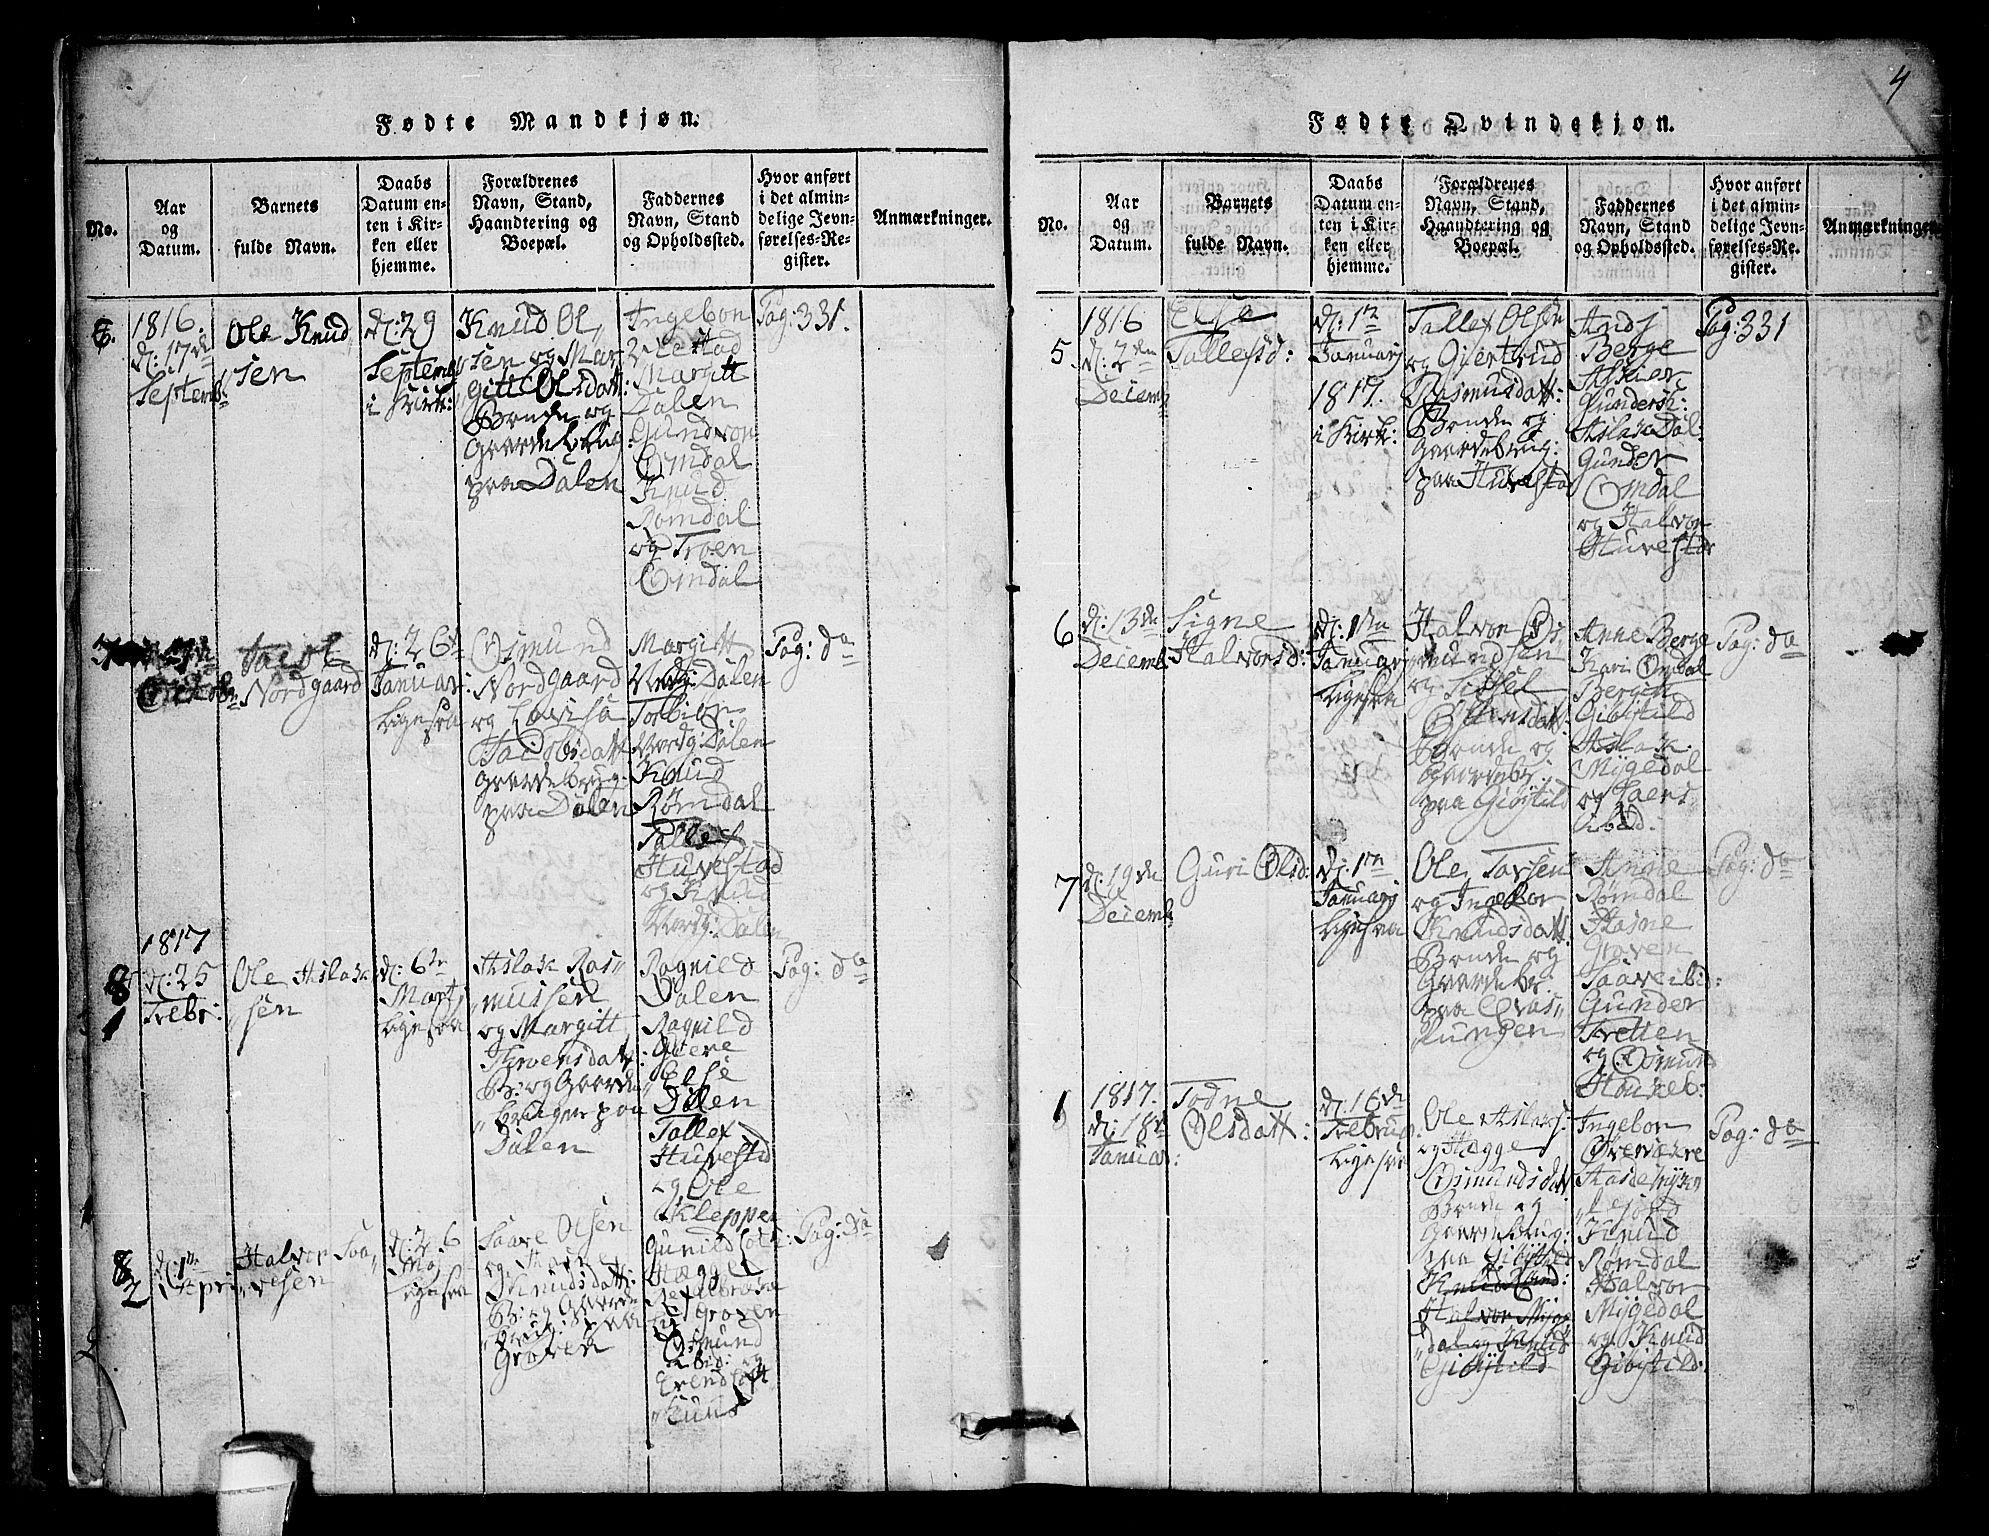 SAKO, Lårdal kirkebøker, G/Gb/L0001: Klokkerbok nr. II 1, 1815-1865, s. 4